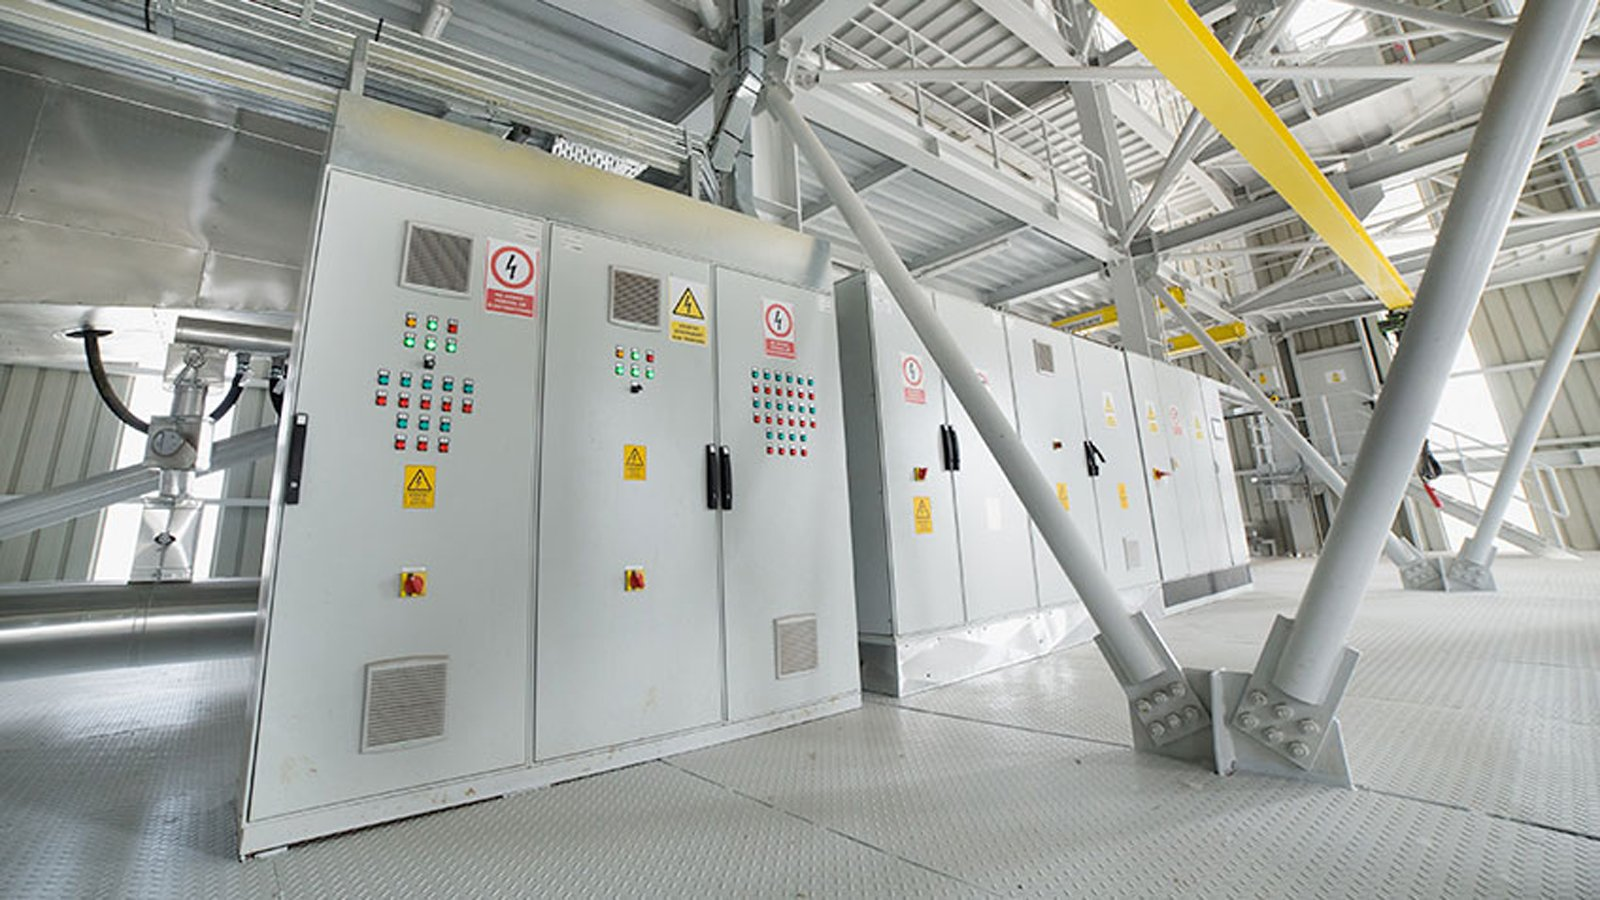 PlantPAx DCS Helps Address Power-Gen Emissions